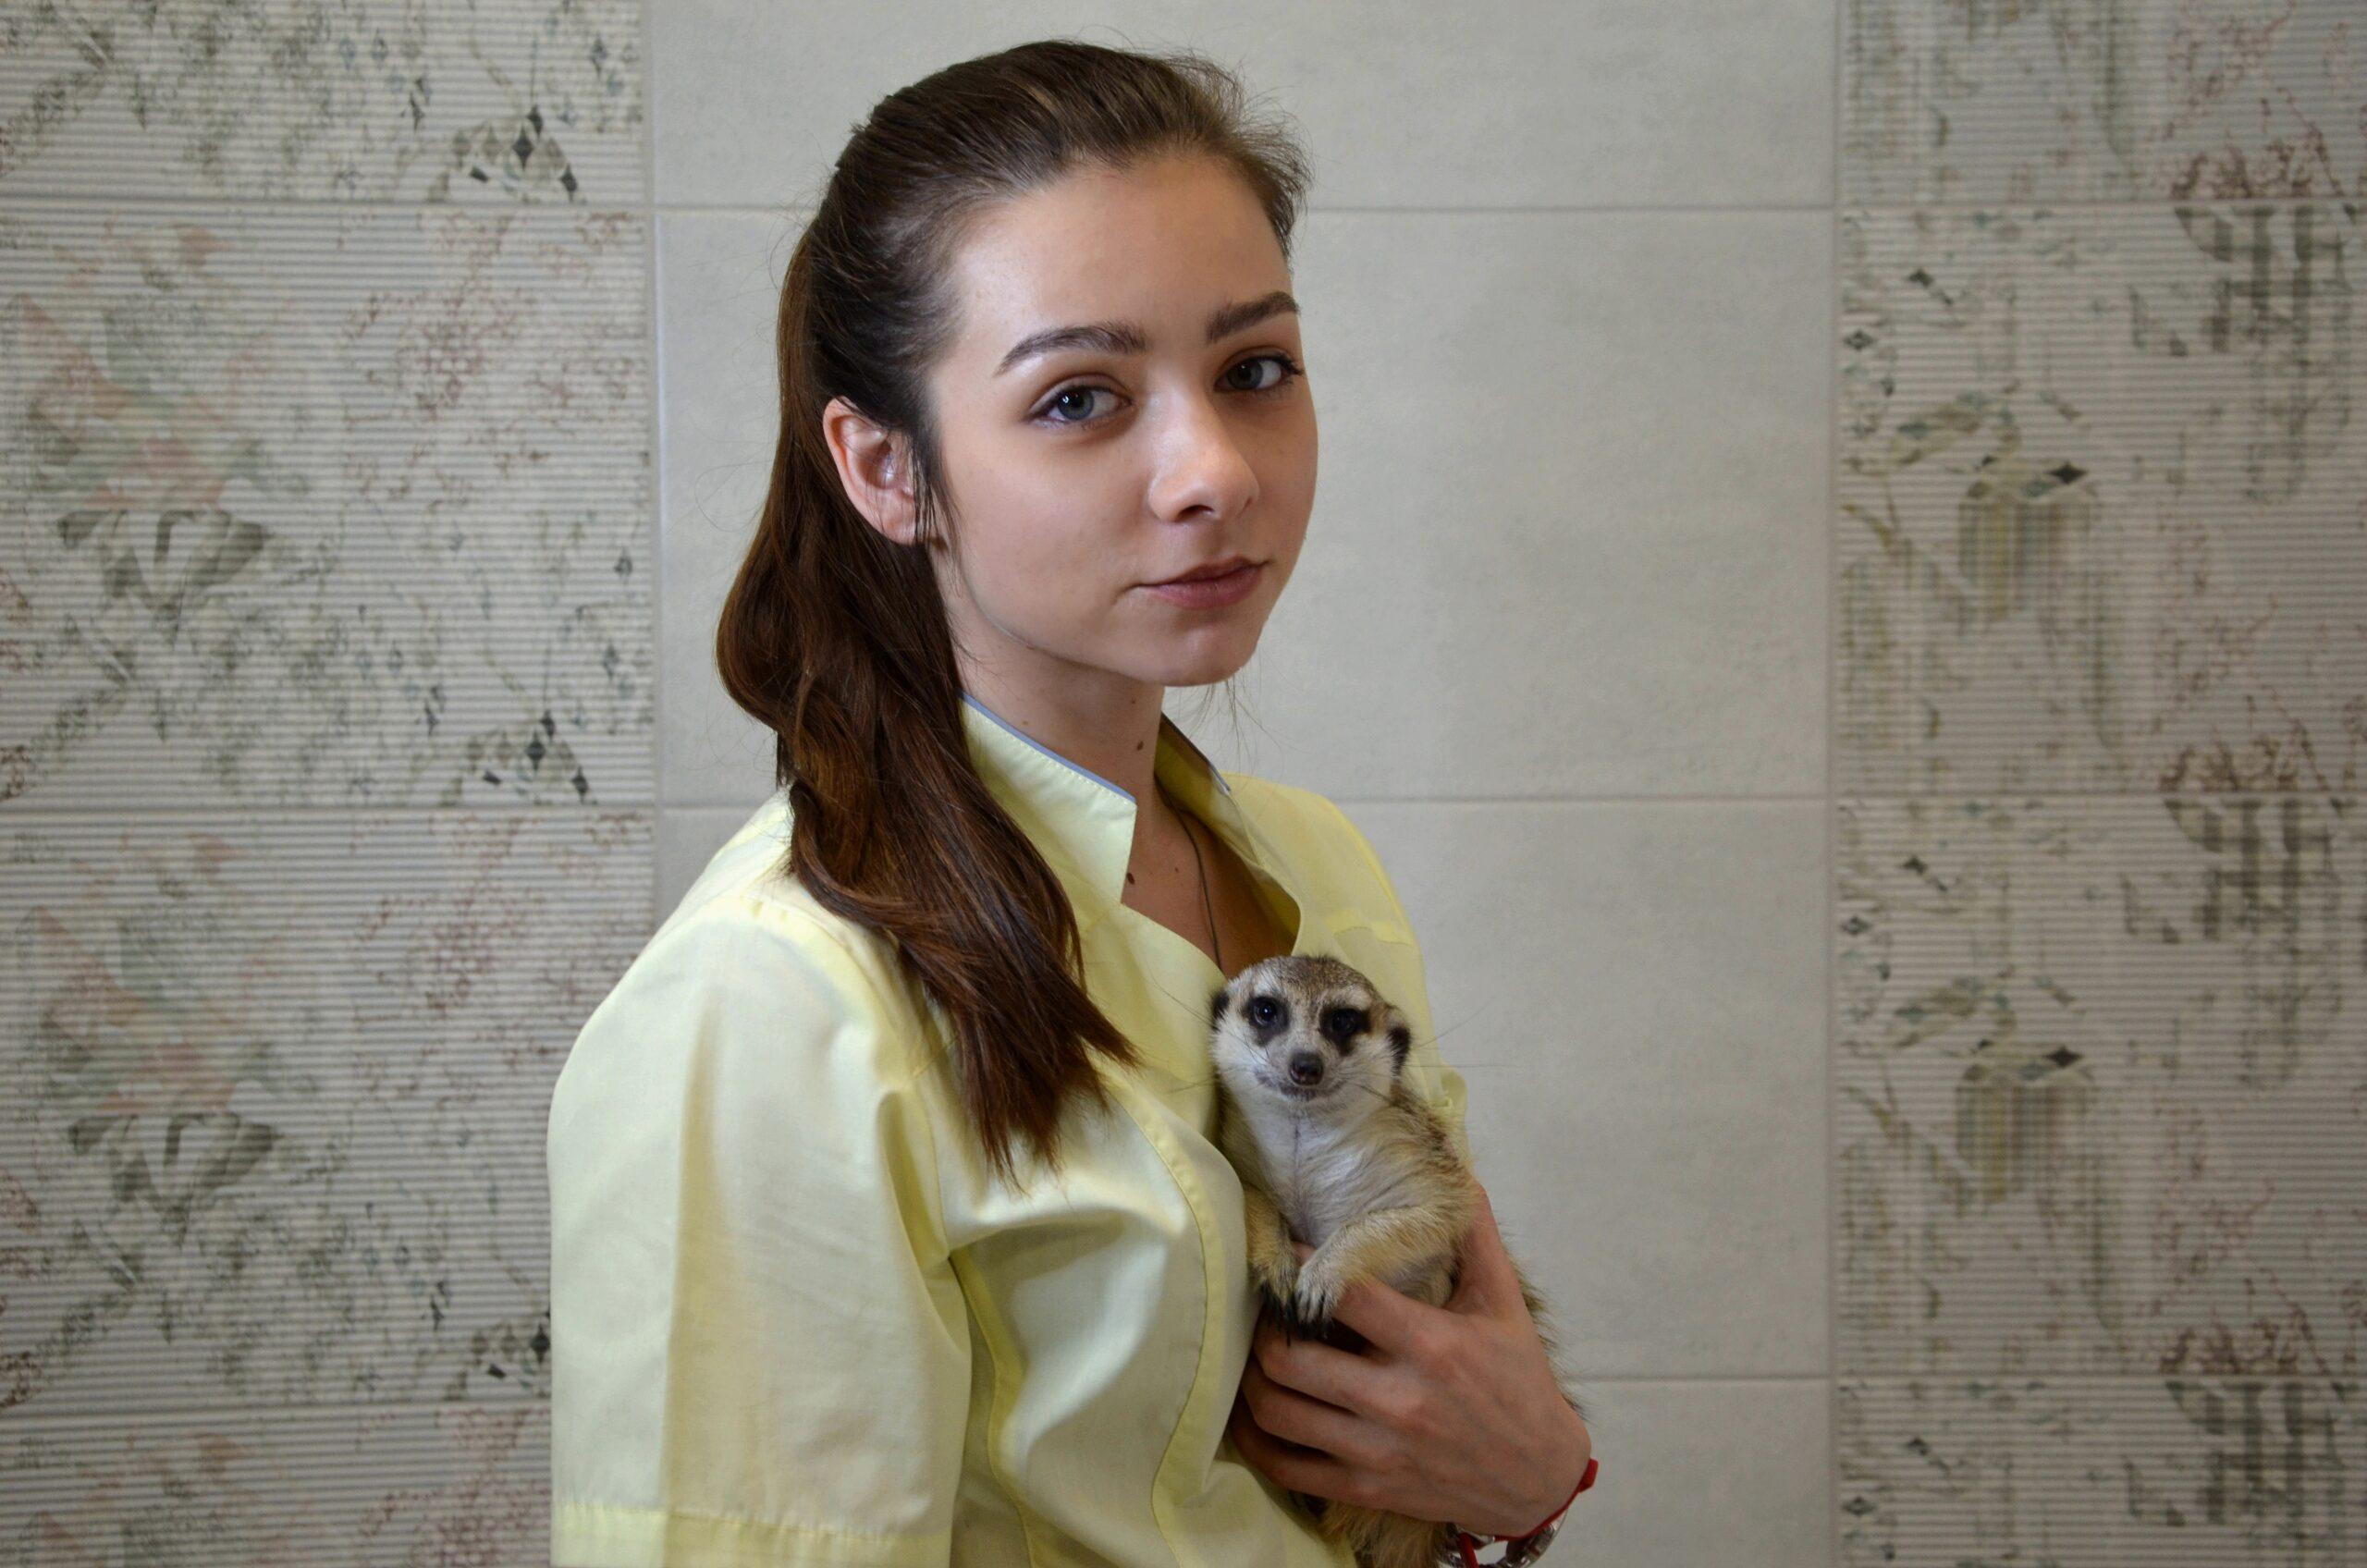 Шелофаст Мария Витальевна